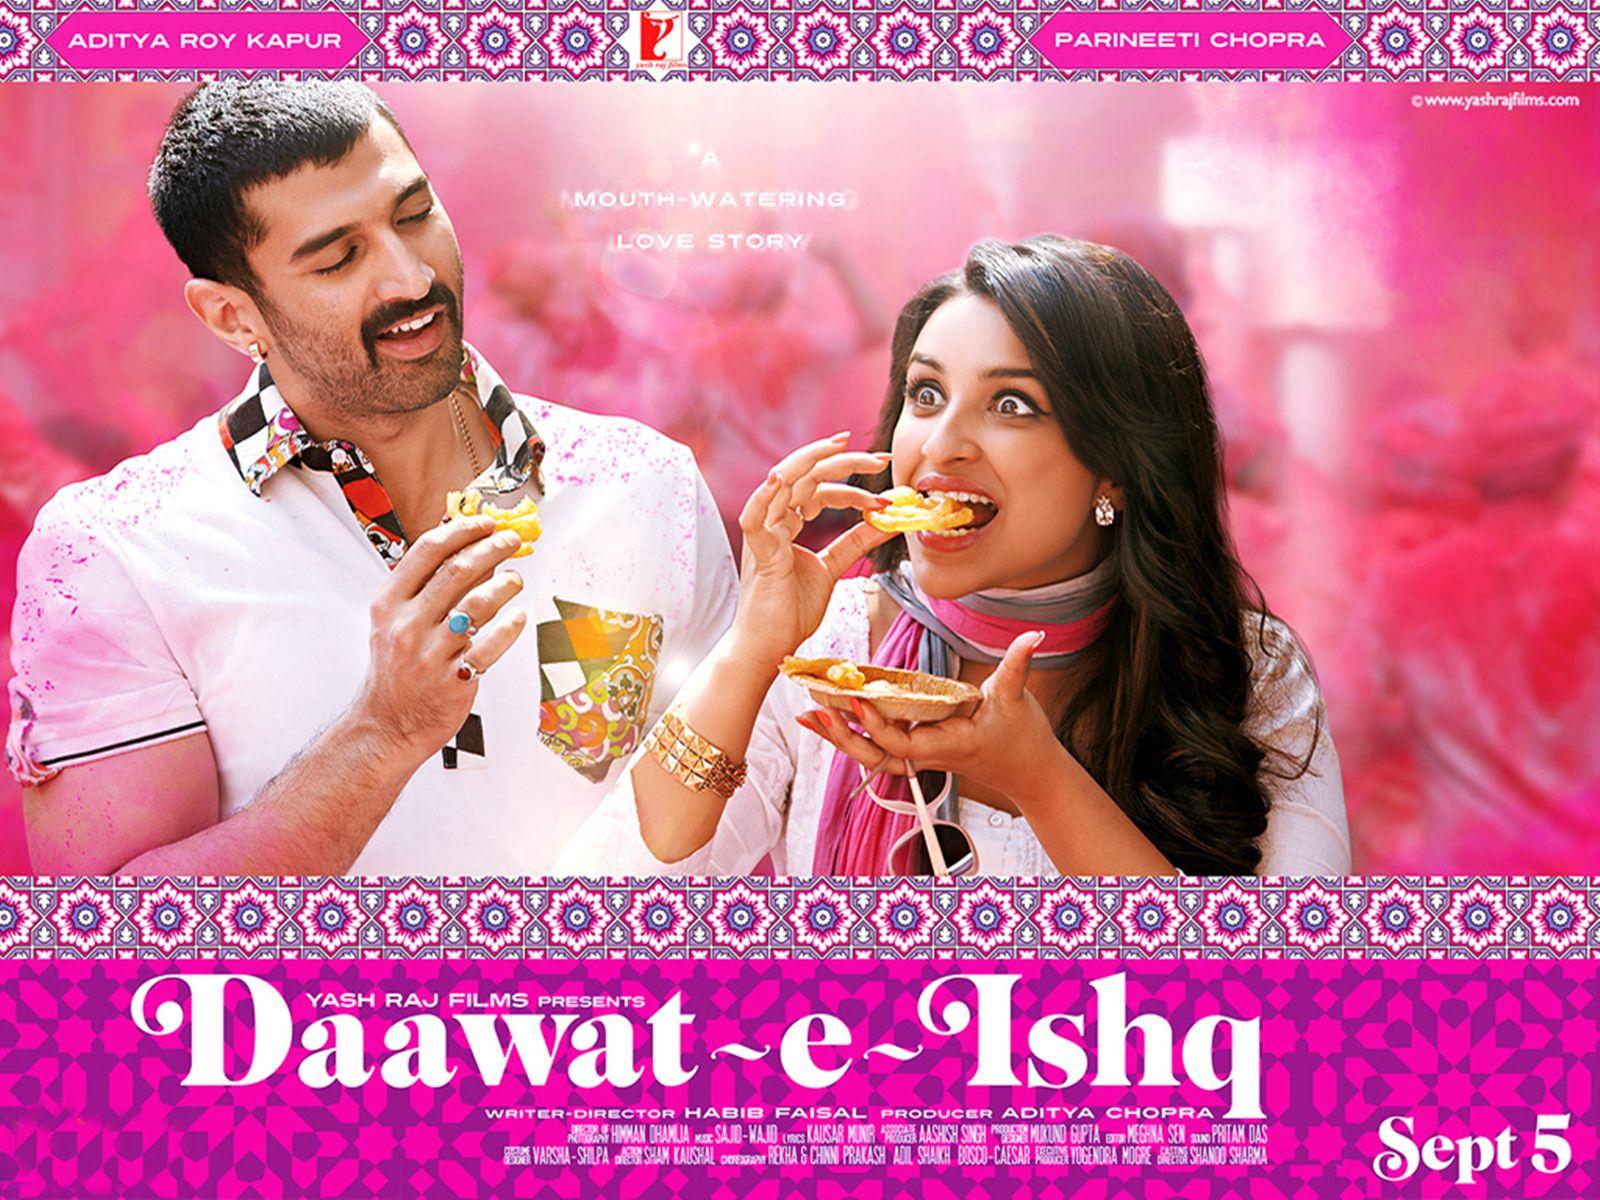 Daawat-e-Ishq (2014) Hindi Movie DVDRip 720P ESubs ~ Mp3 ... Daawat E Ishq